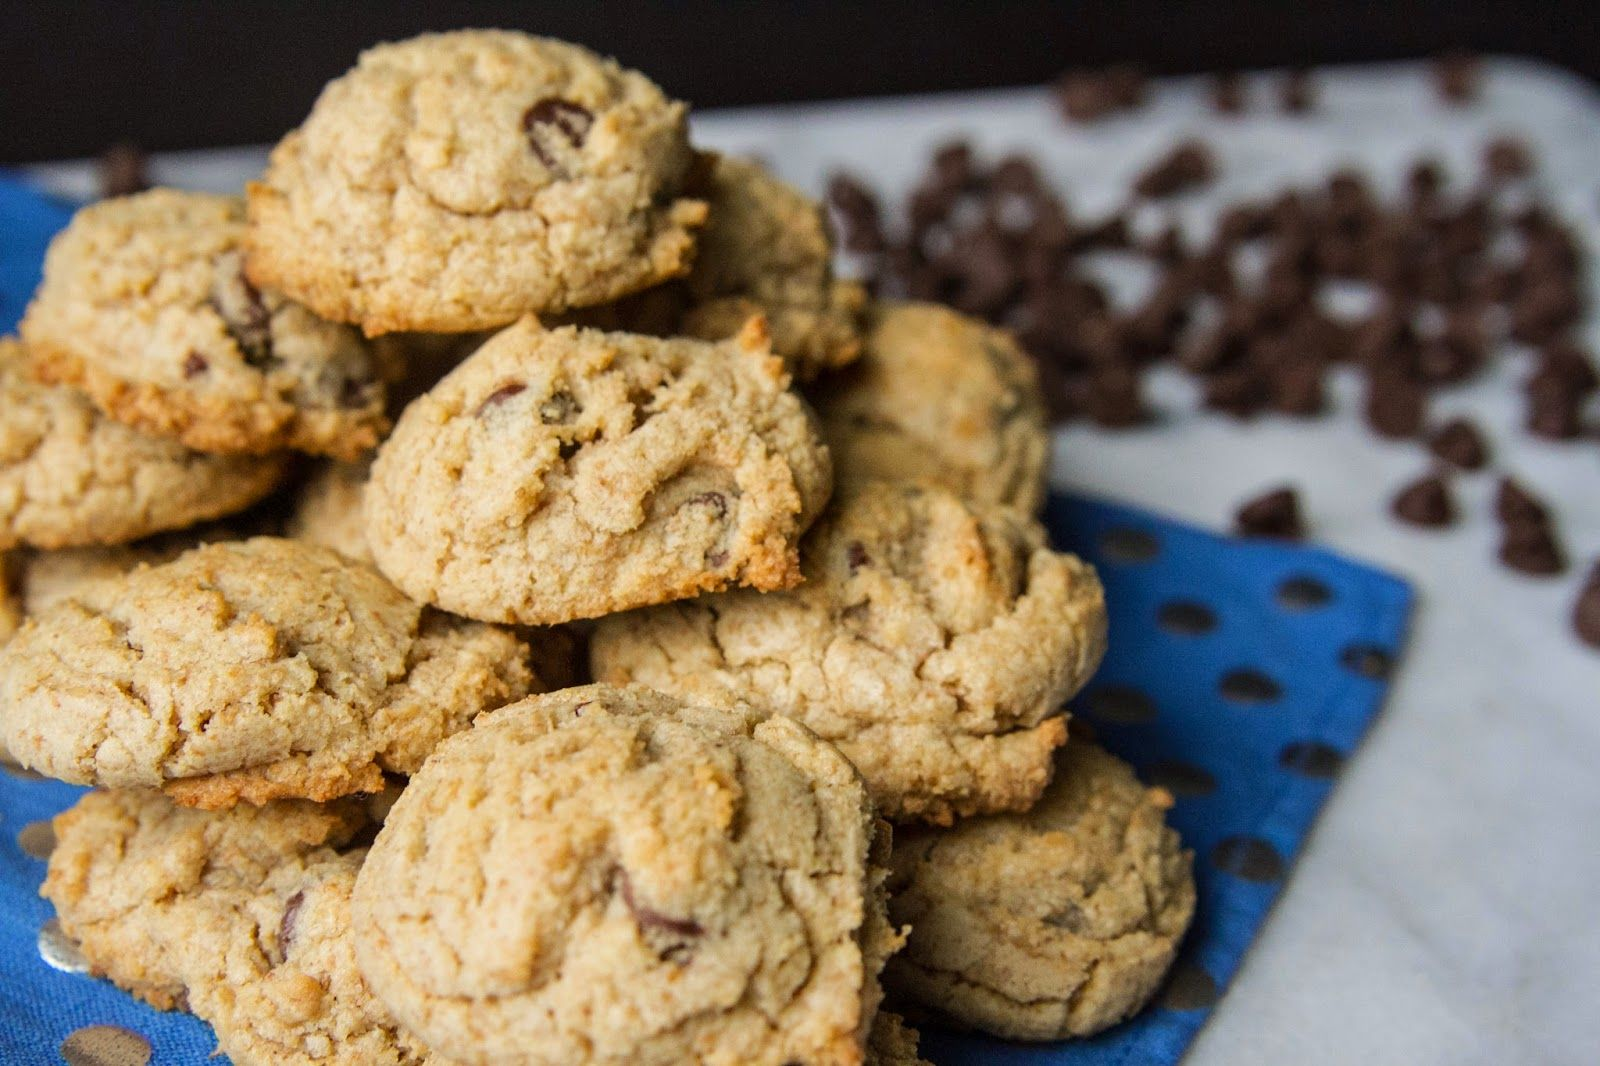 Whole Wheat Chocolate Chip Cookies and Sea Salt | Swim, Eat, Repeat